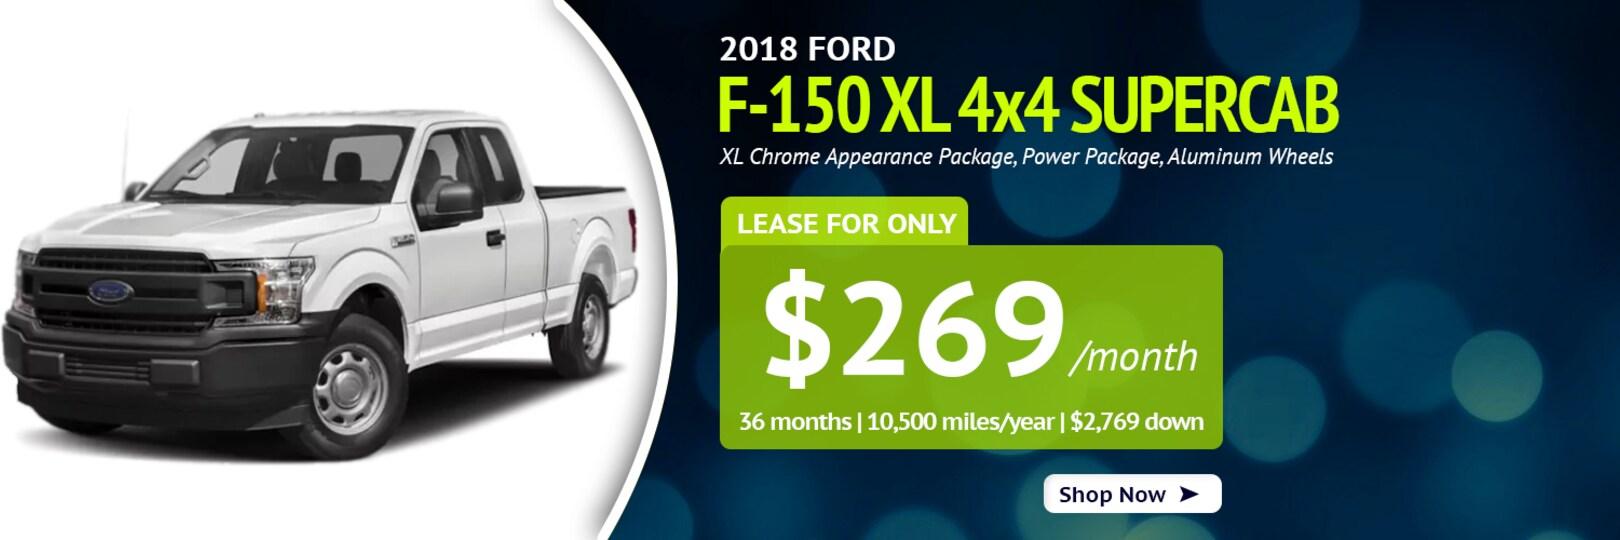 Darlings Bangor Ford Ford Dealership In Darlings Ford VW Audi ME - Ford dealers in maine